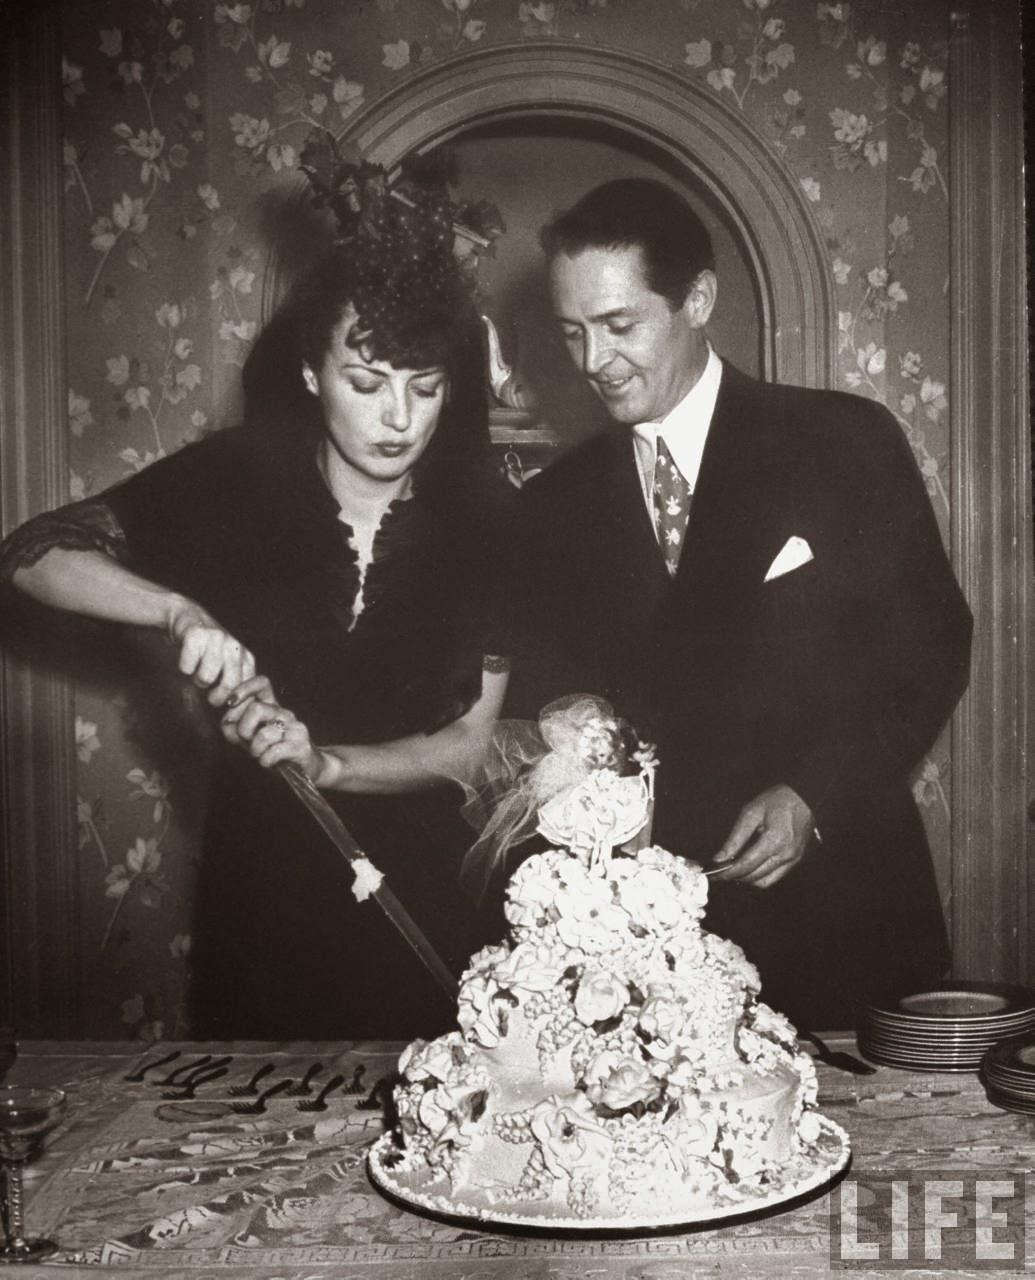 Time Machine To The Twenties: Gypsy Rose, Birthday Girl